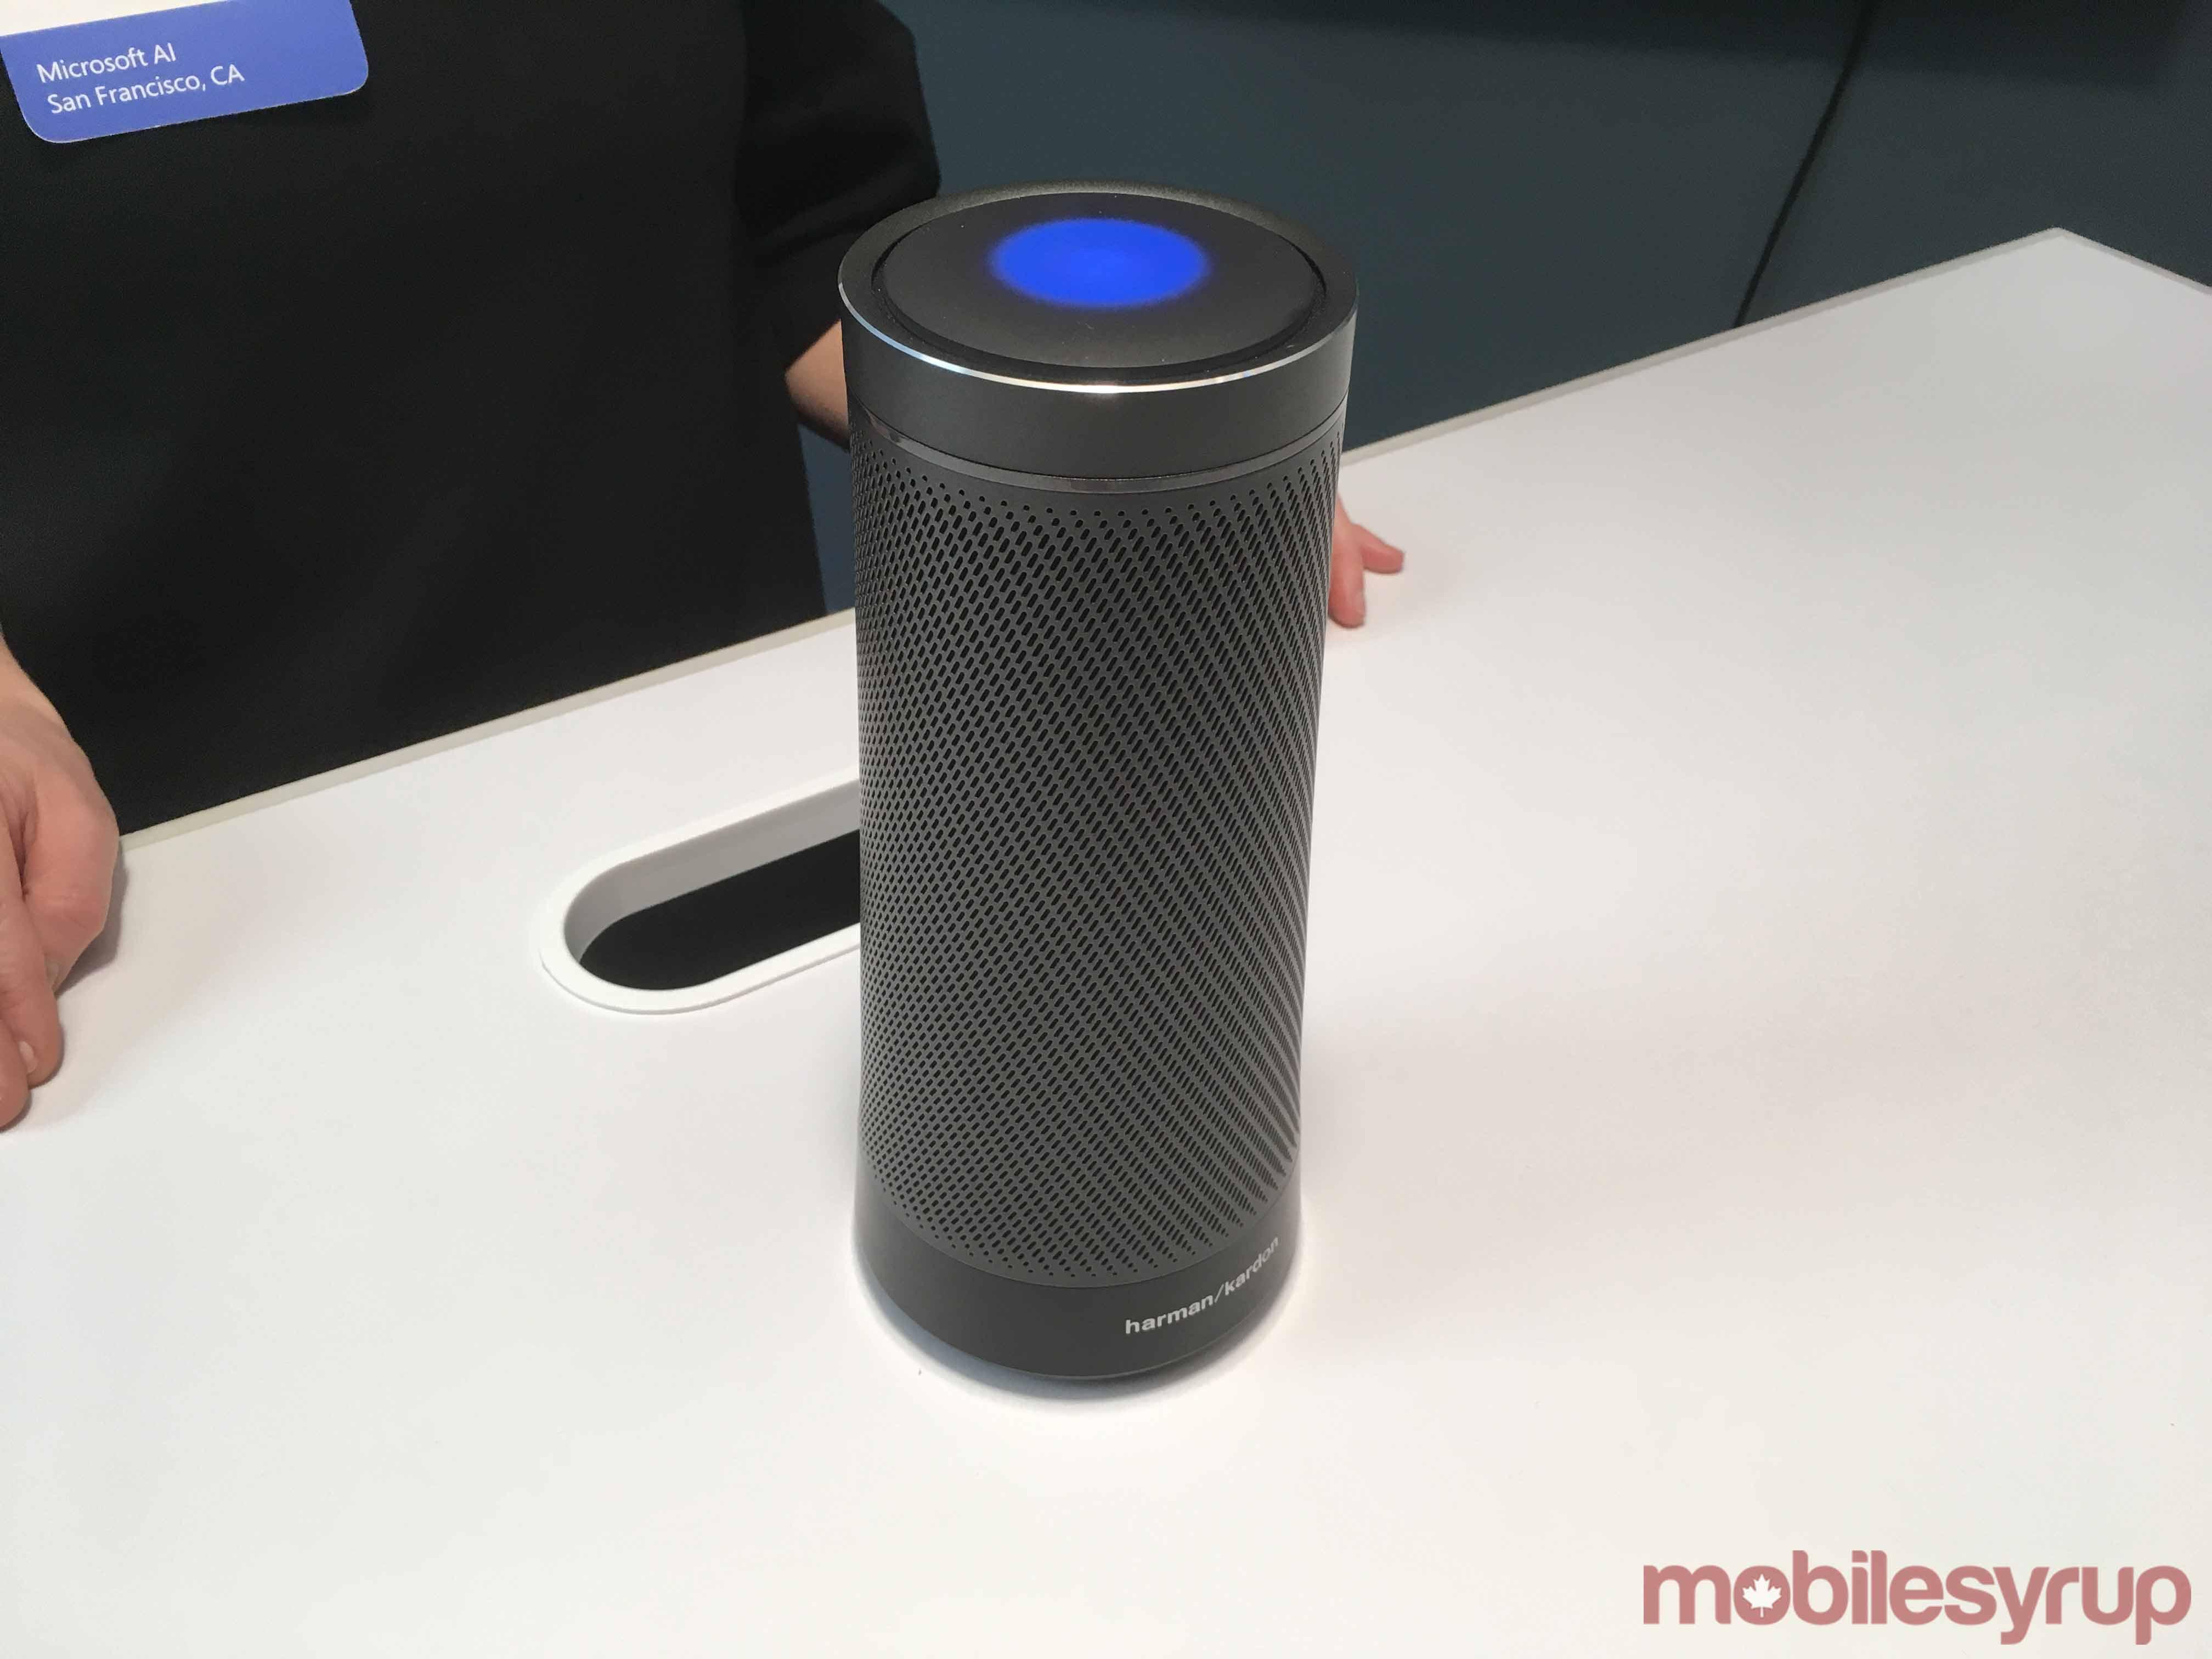 Harman Kardon speaker Cortana